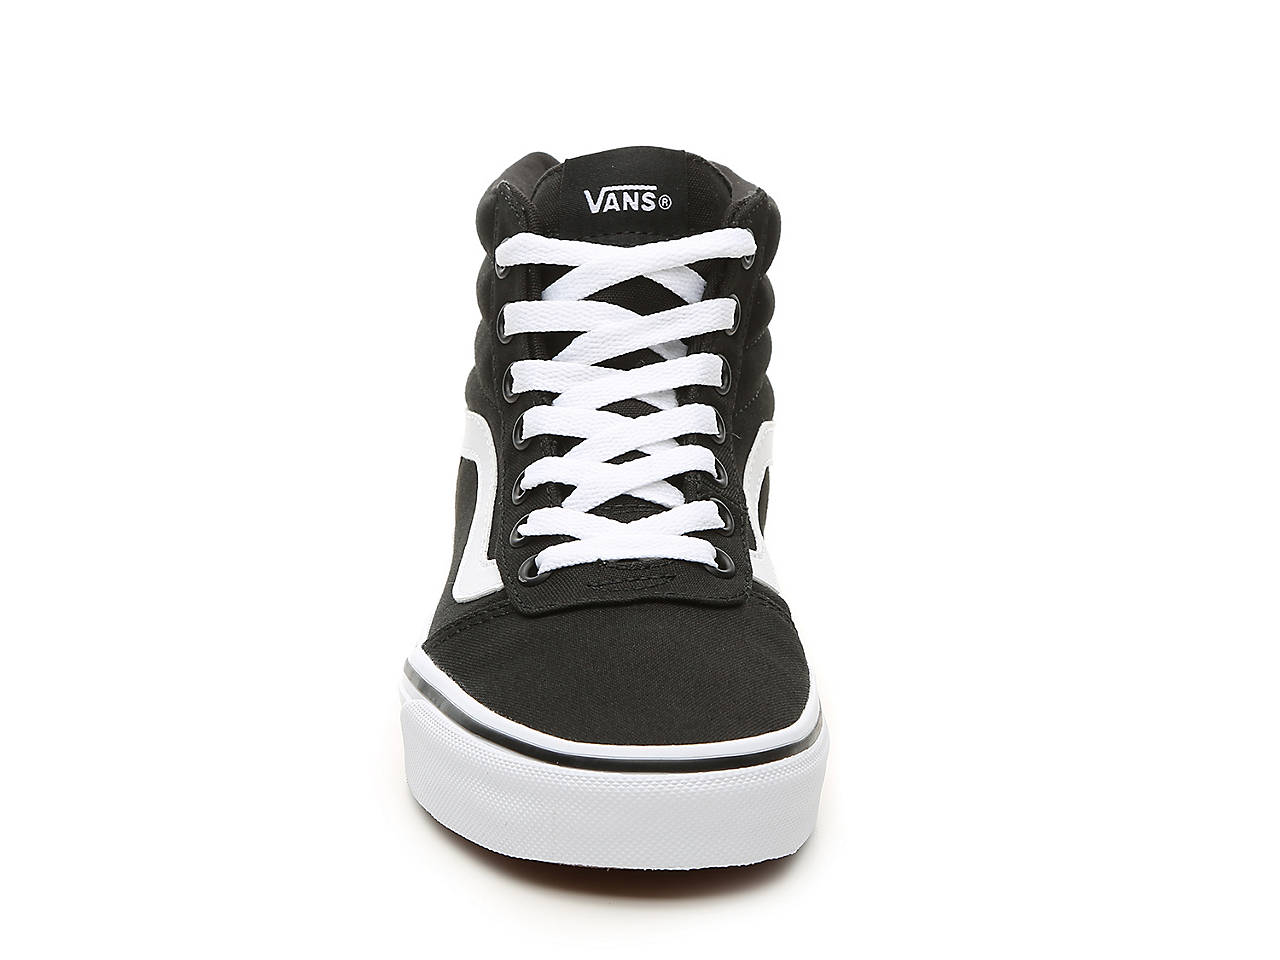 f92d22bce63 Vans Ward High-Top Sneaker - Women s Women s Shoes